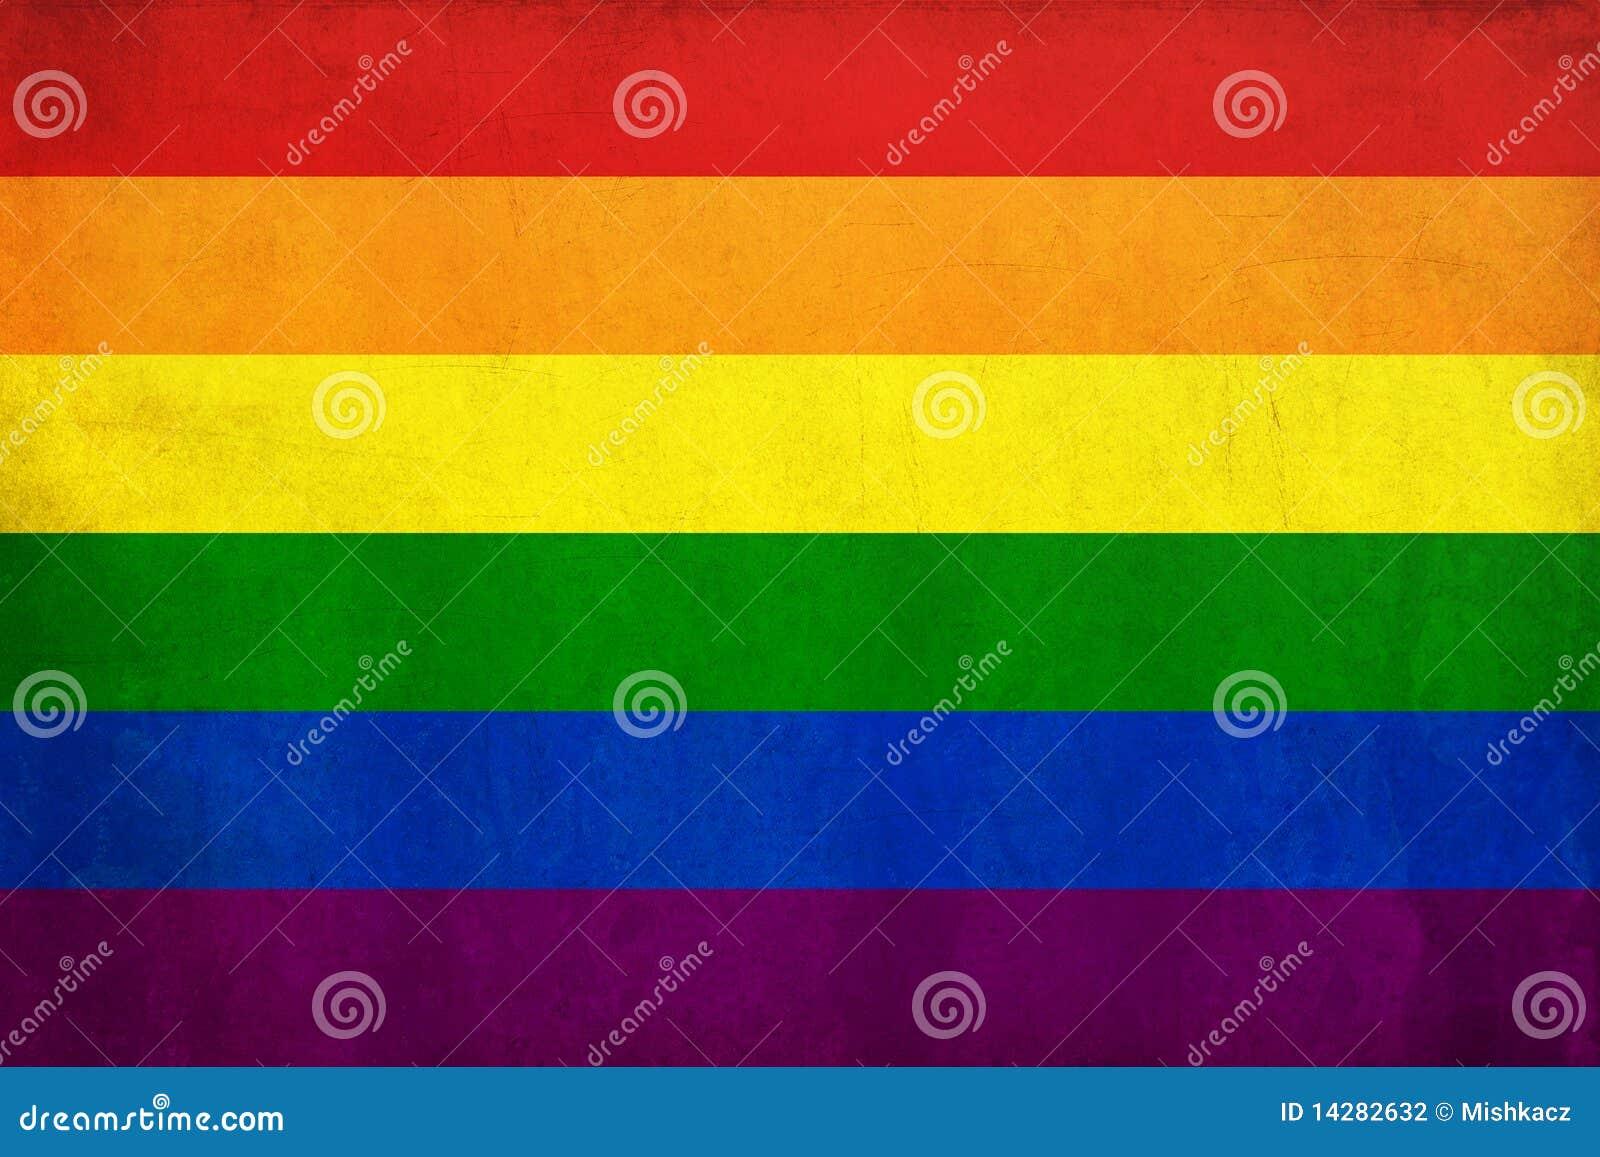 anthology bisexual gay lesbian transgender